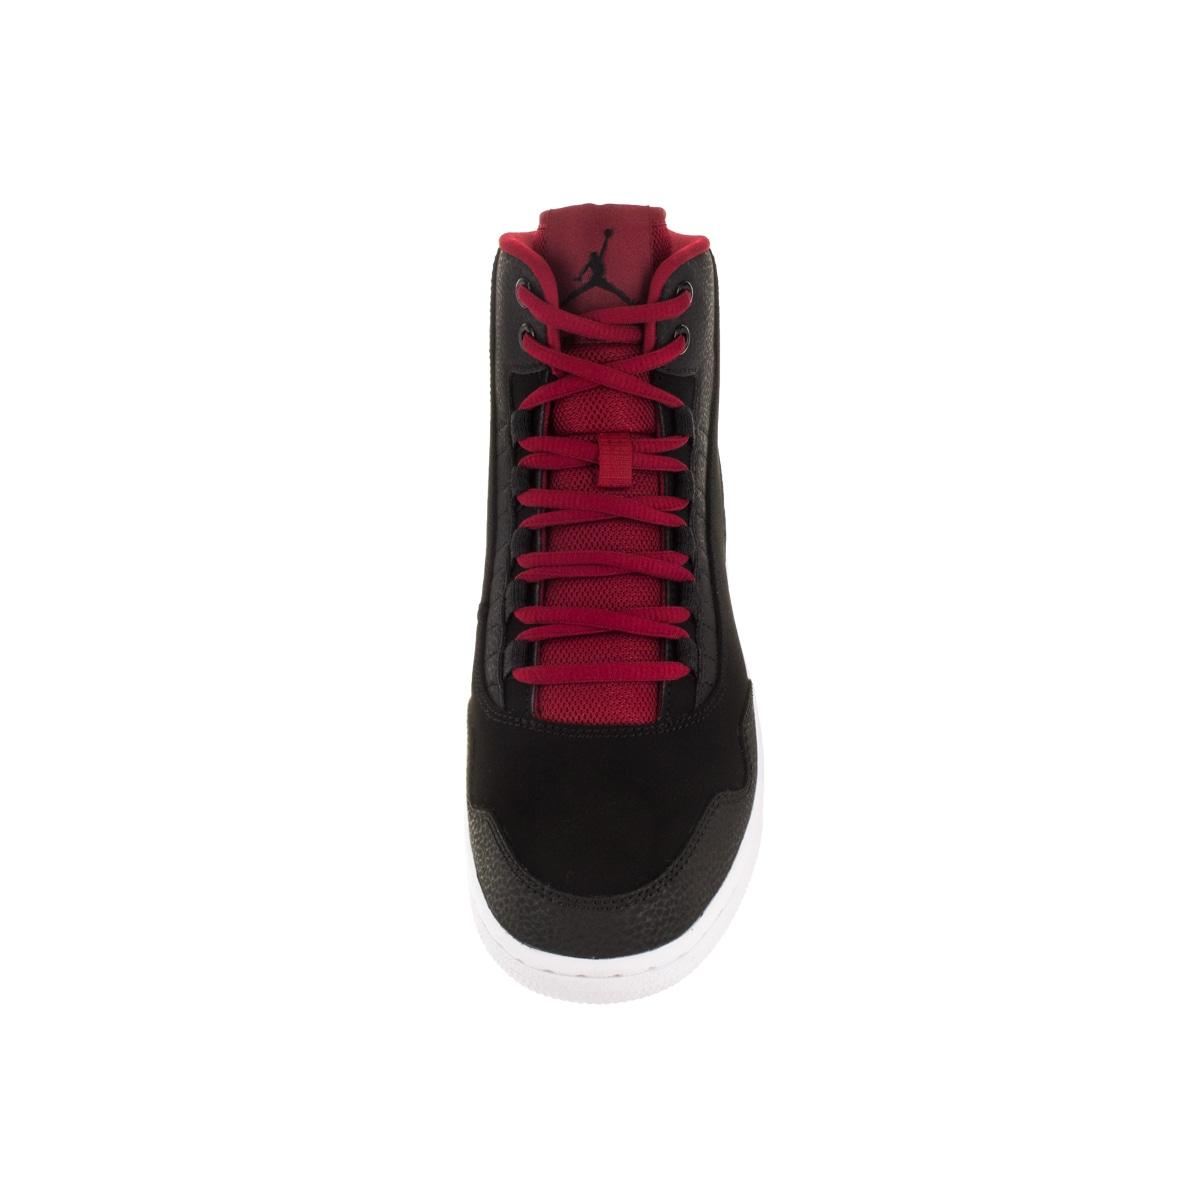 more photos 00fc8 57332 Shop Nike Jordan Kid s Jordan Executive Bg Black Gym Red Gym Red White Basketball  Shoe - Free Shipping Today - Overstock - 12322356